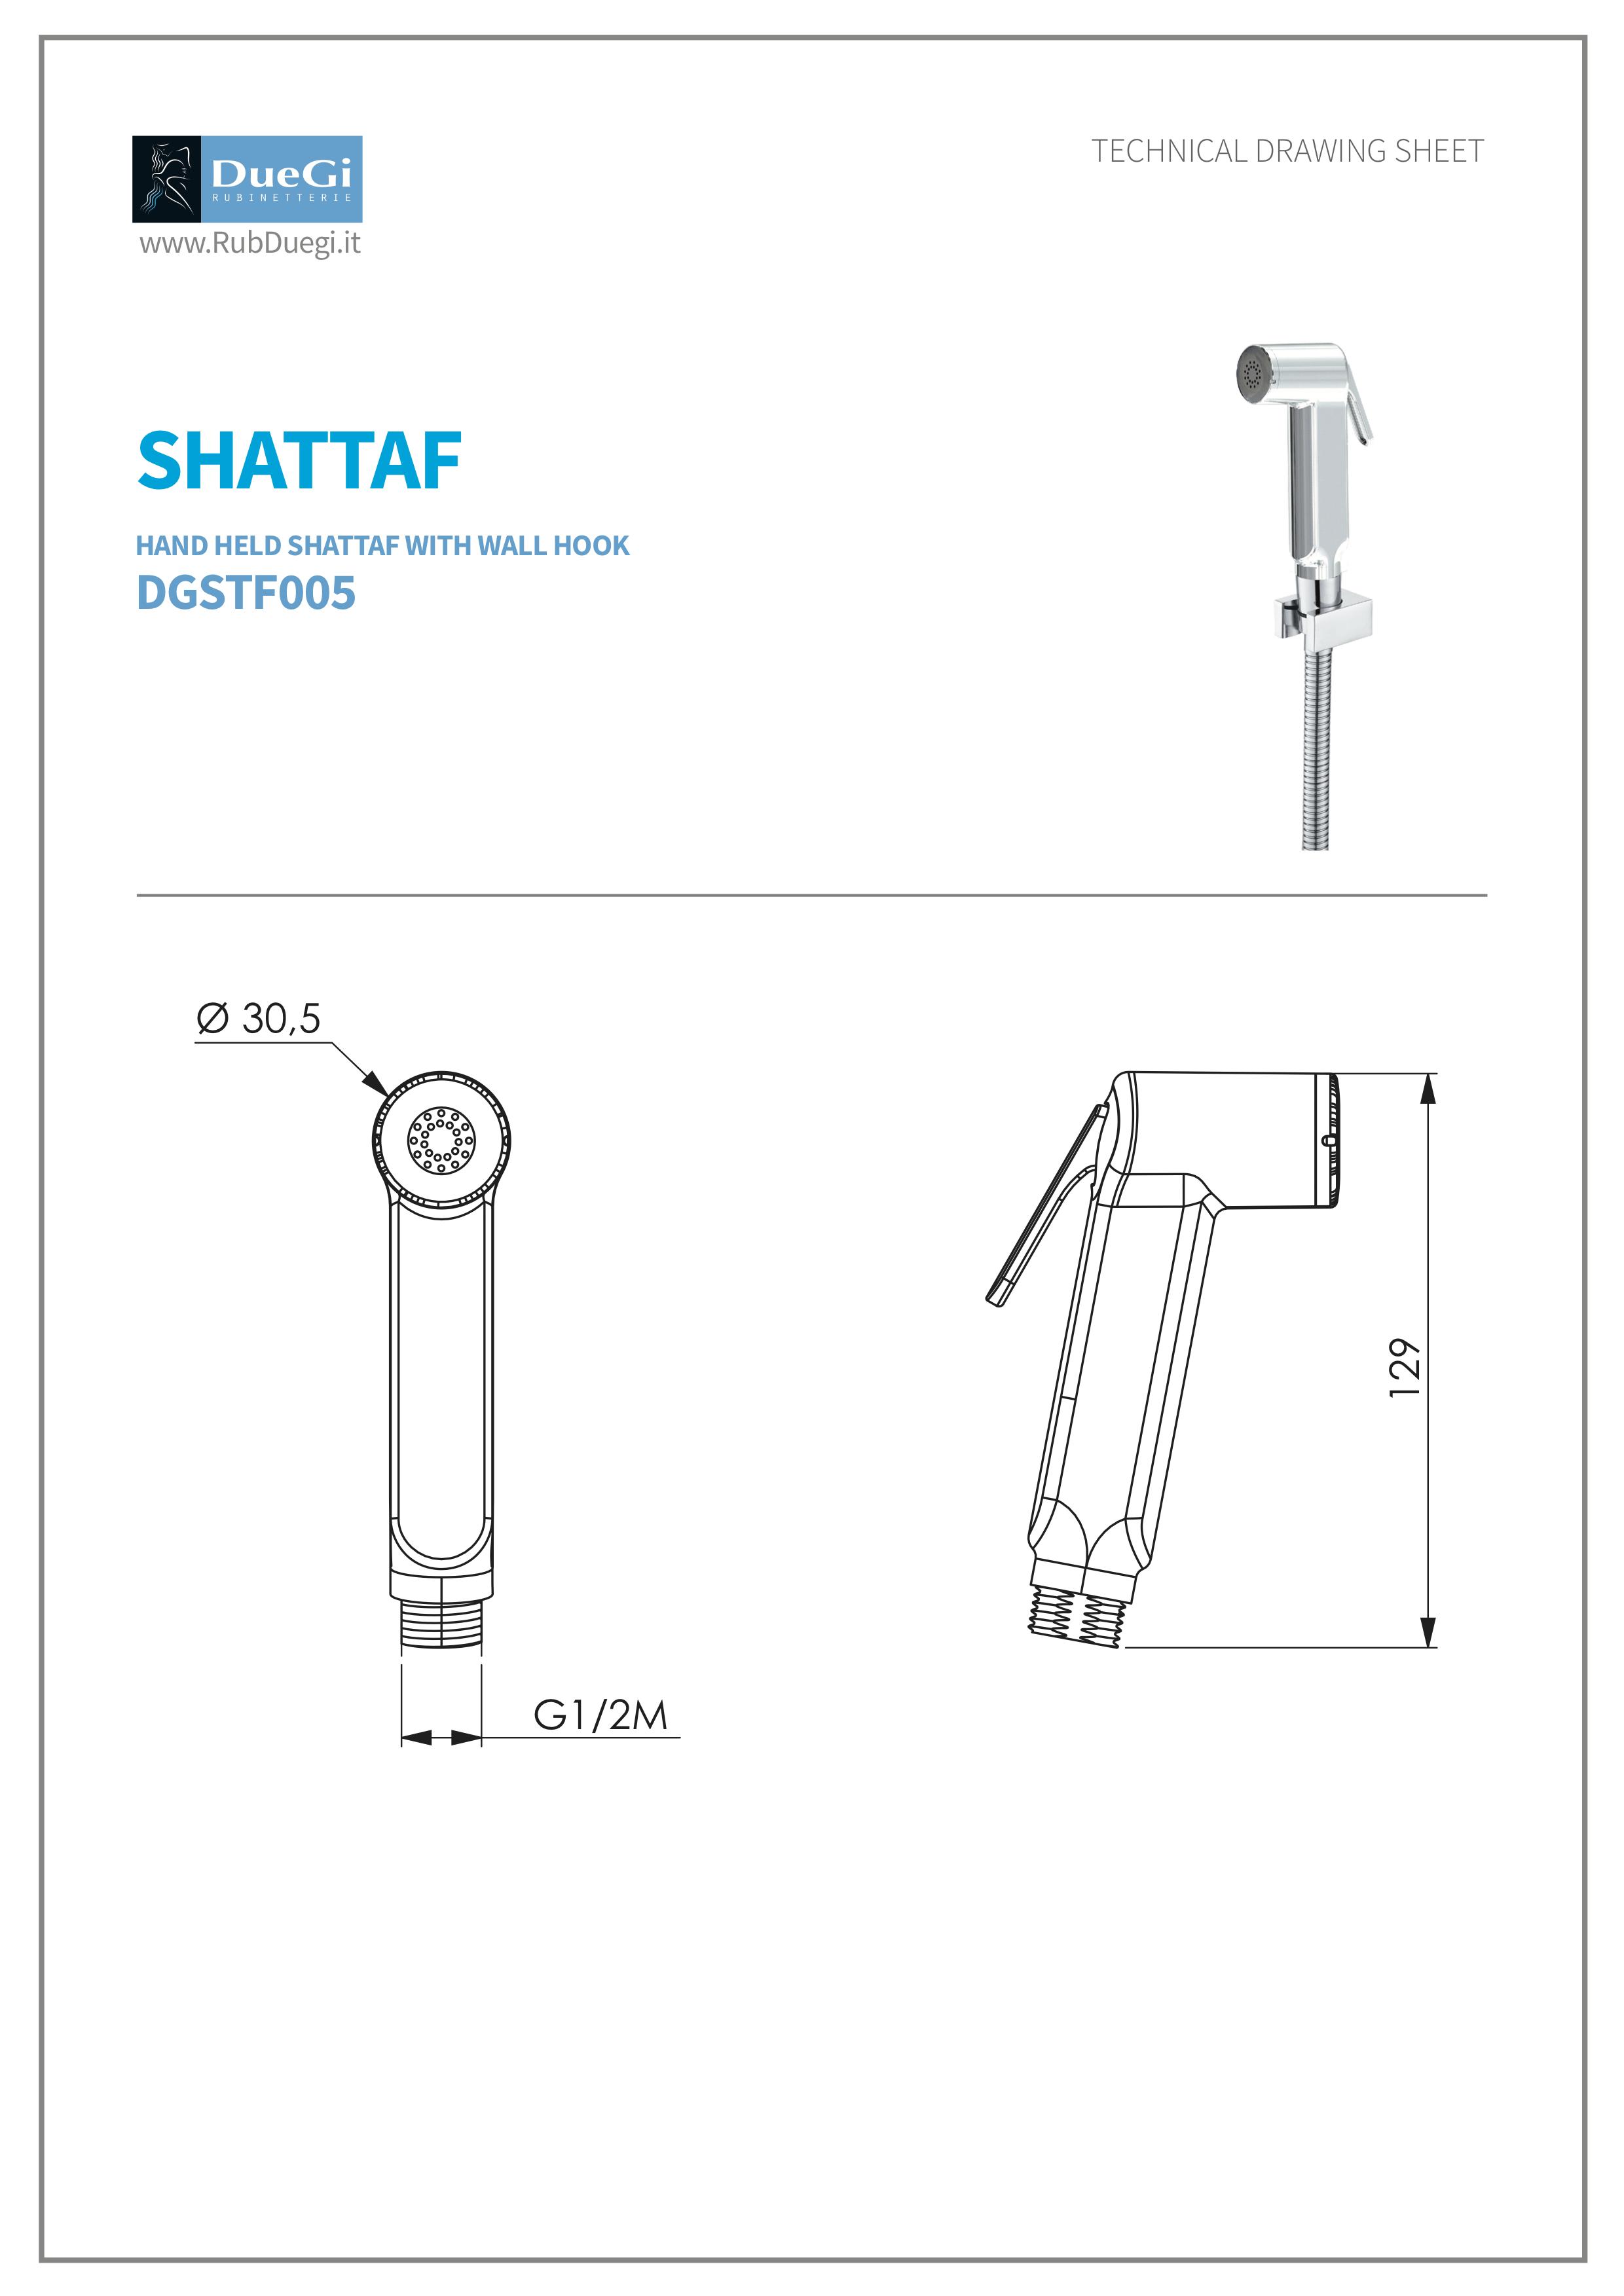 Shattaf DGSTF005